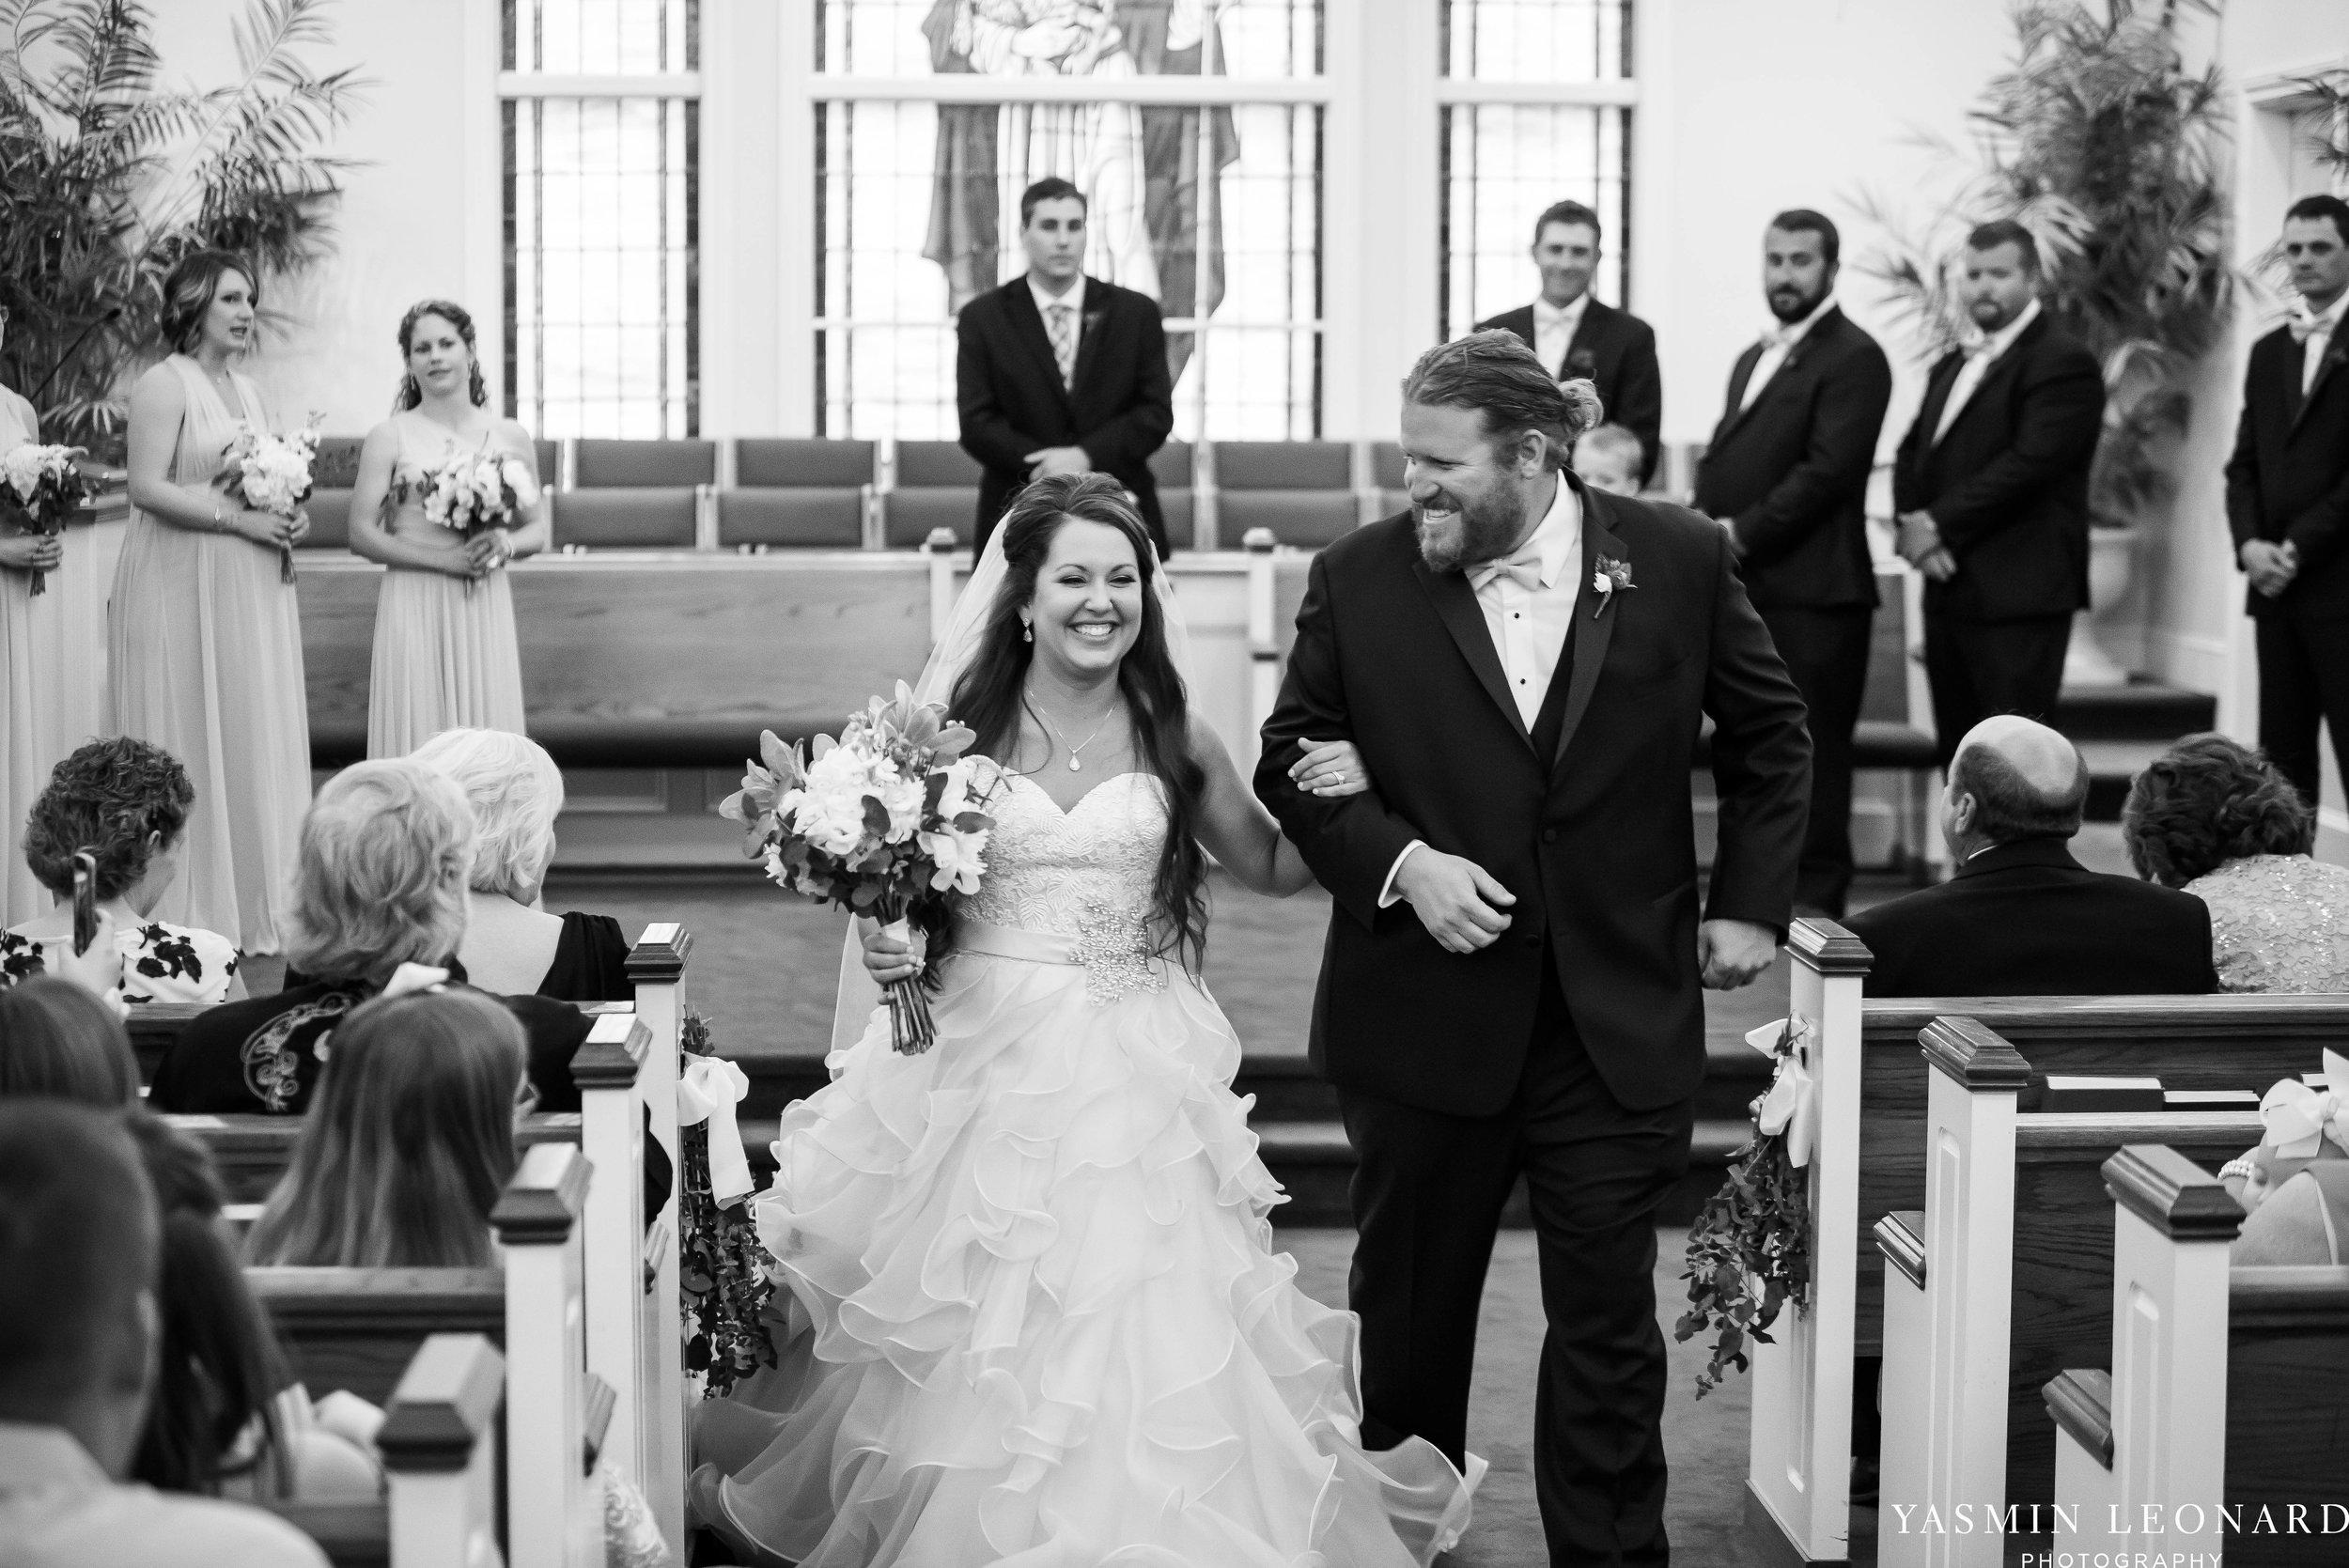 Rain on your wedding day - Rainy Wedding - Plan B for Rain - What to do if it rains on your wedding day - Wedding Inspiration - Outdoor wedding ideas - Rainy Wedding Pictures - Yasmin Leonard Photography-28.jpg